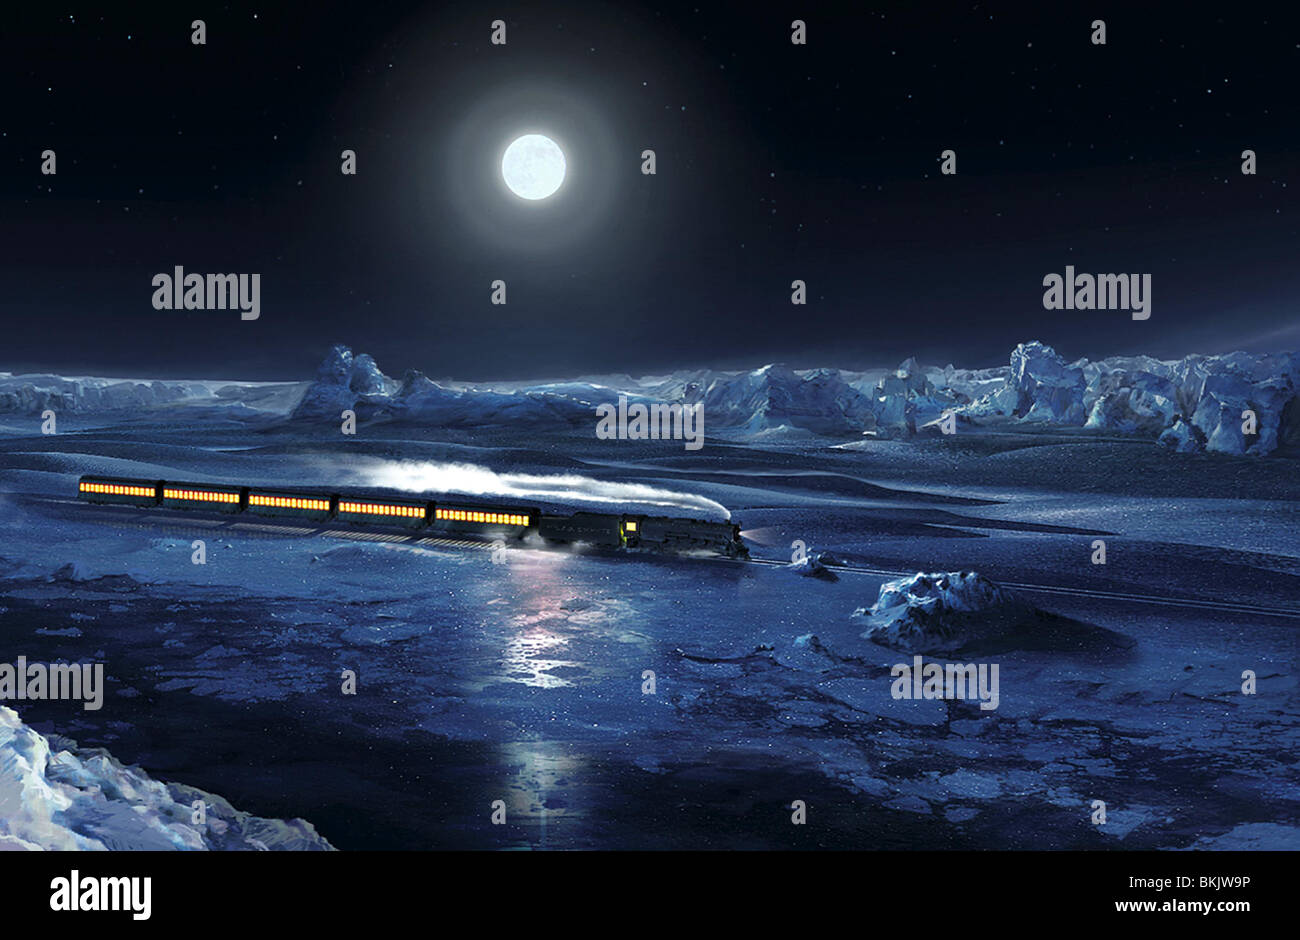 The Polar Express 2004 Stock Photo Alamy